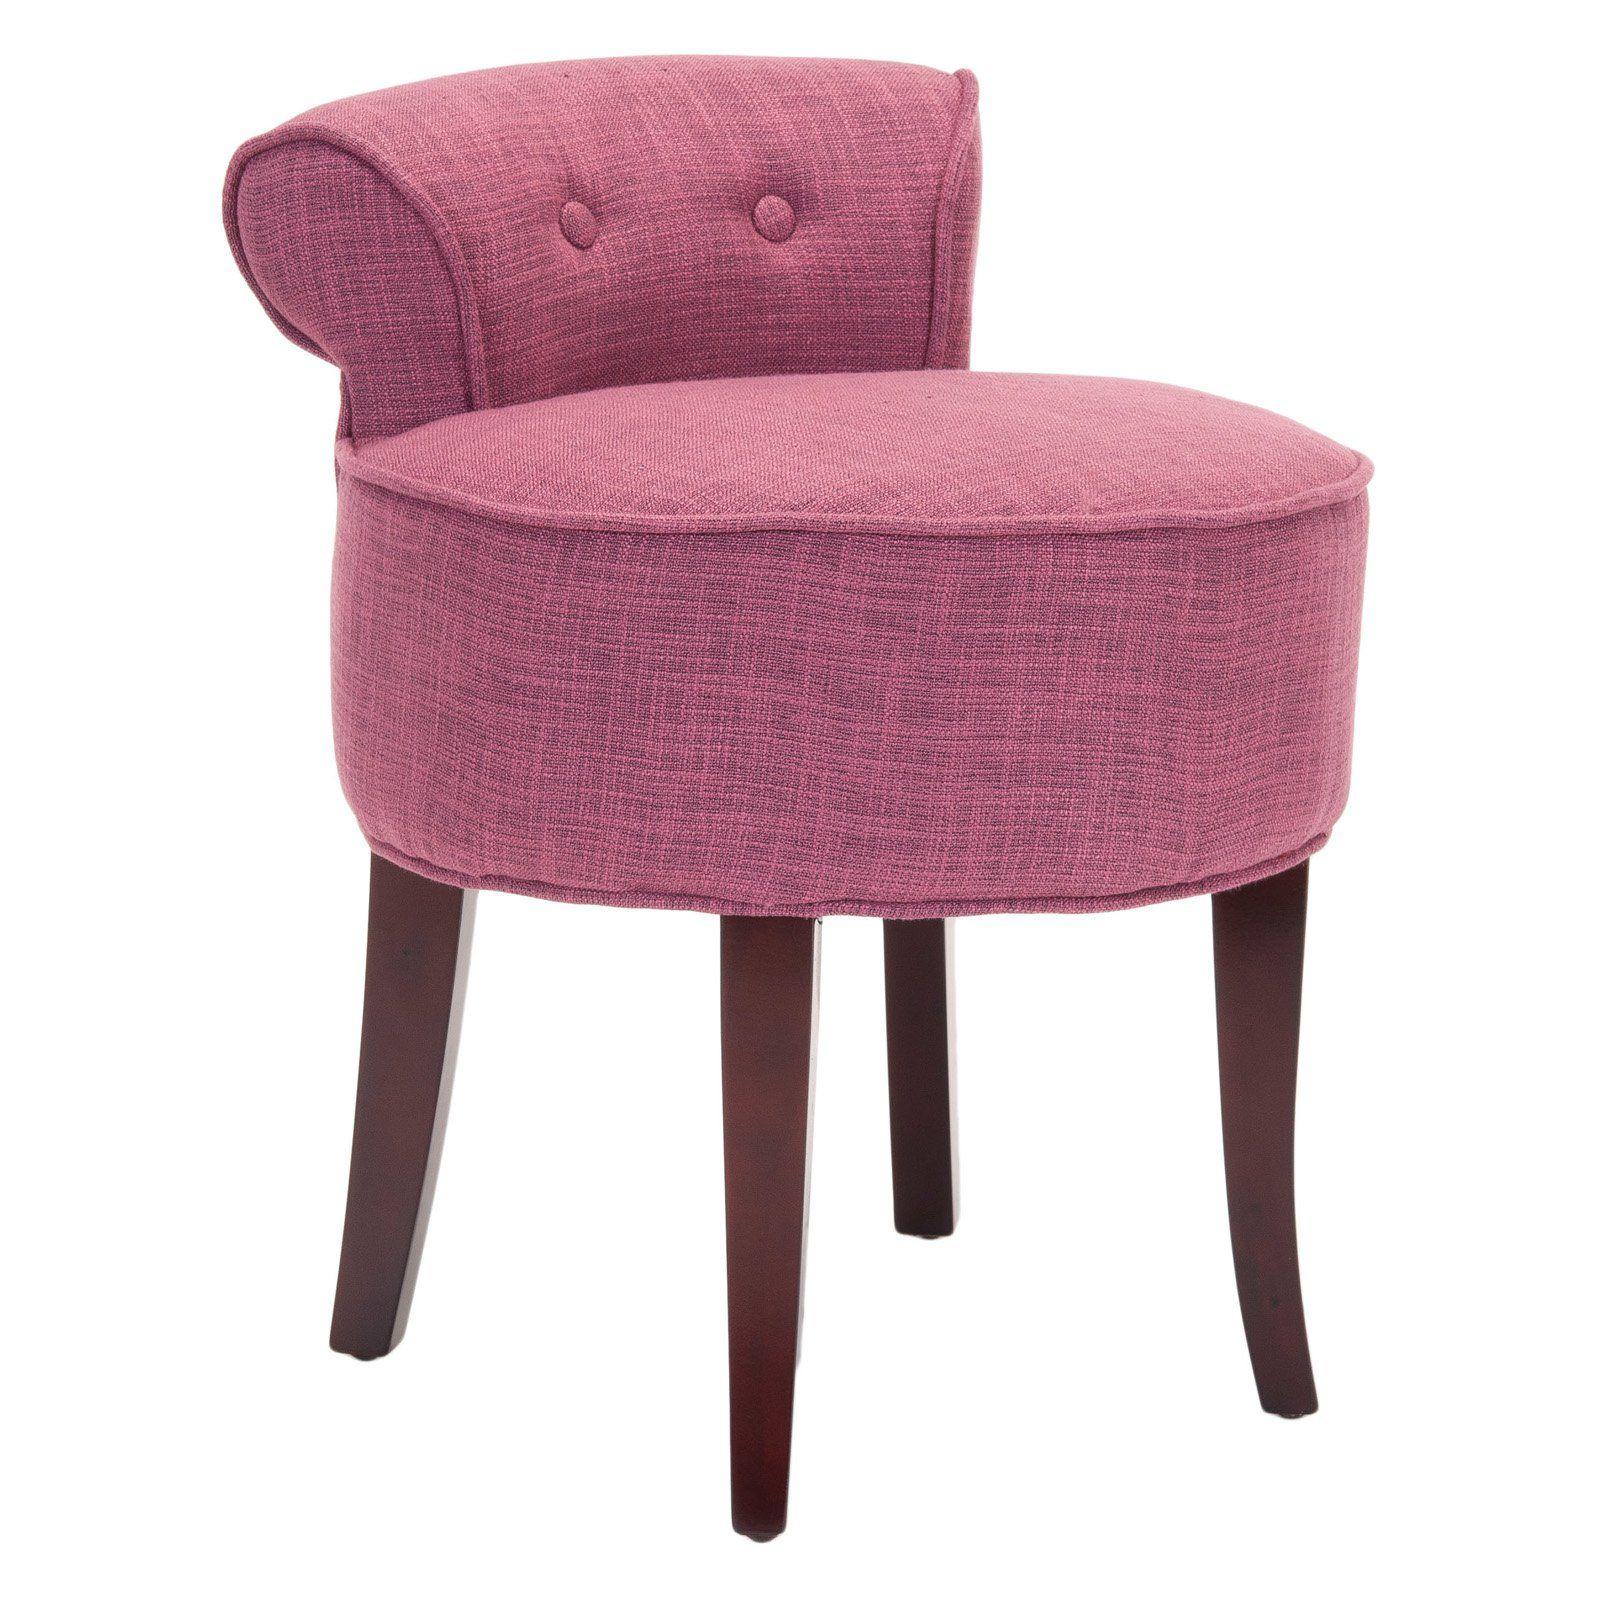 Astounding Safavieh Georgia Round Vanity Stool Pink In 2019 Vanity Machost Co Dining Chair Design Ideas Machostcouk